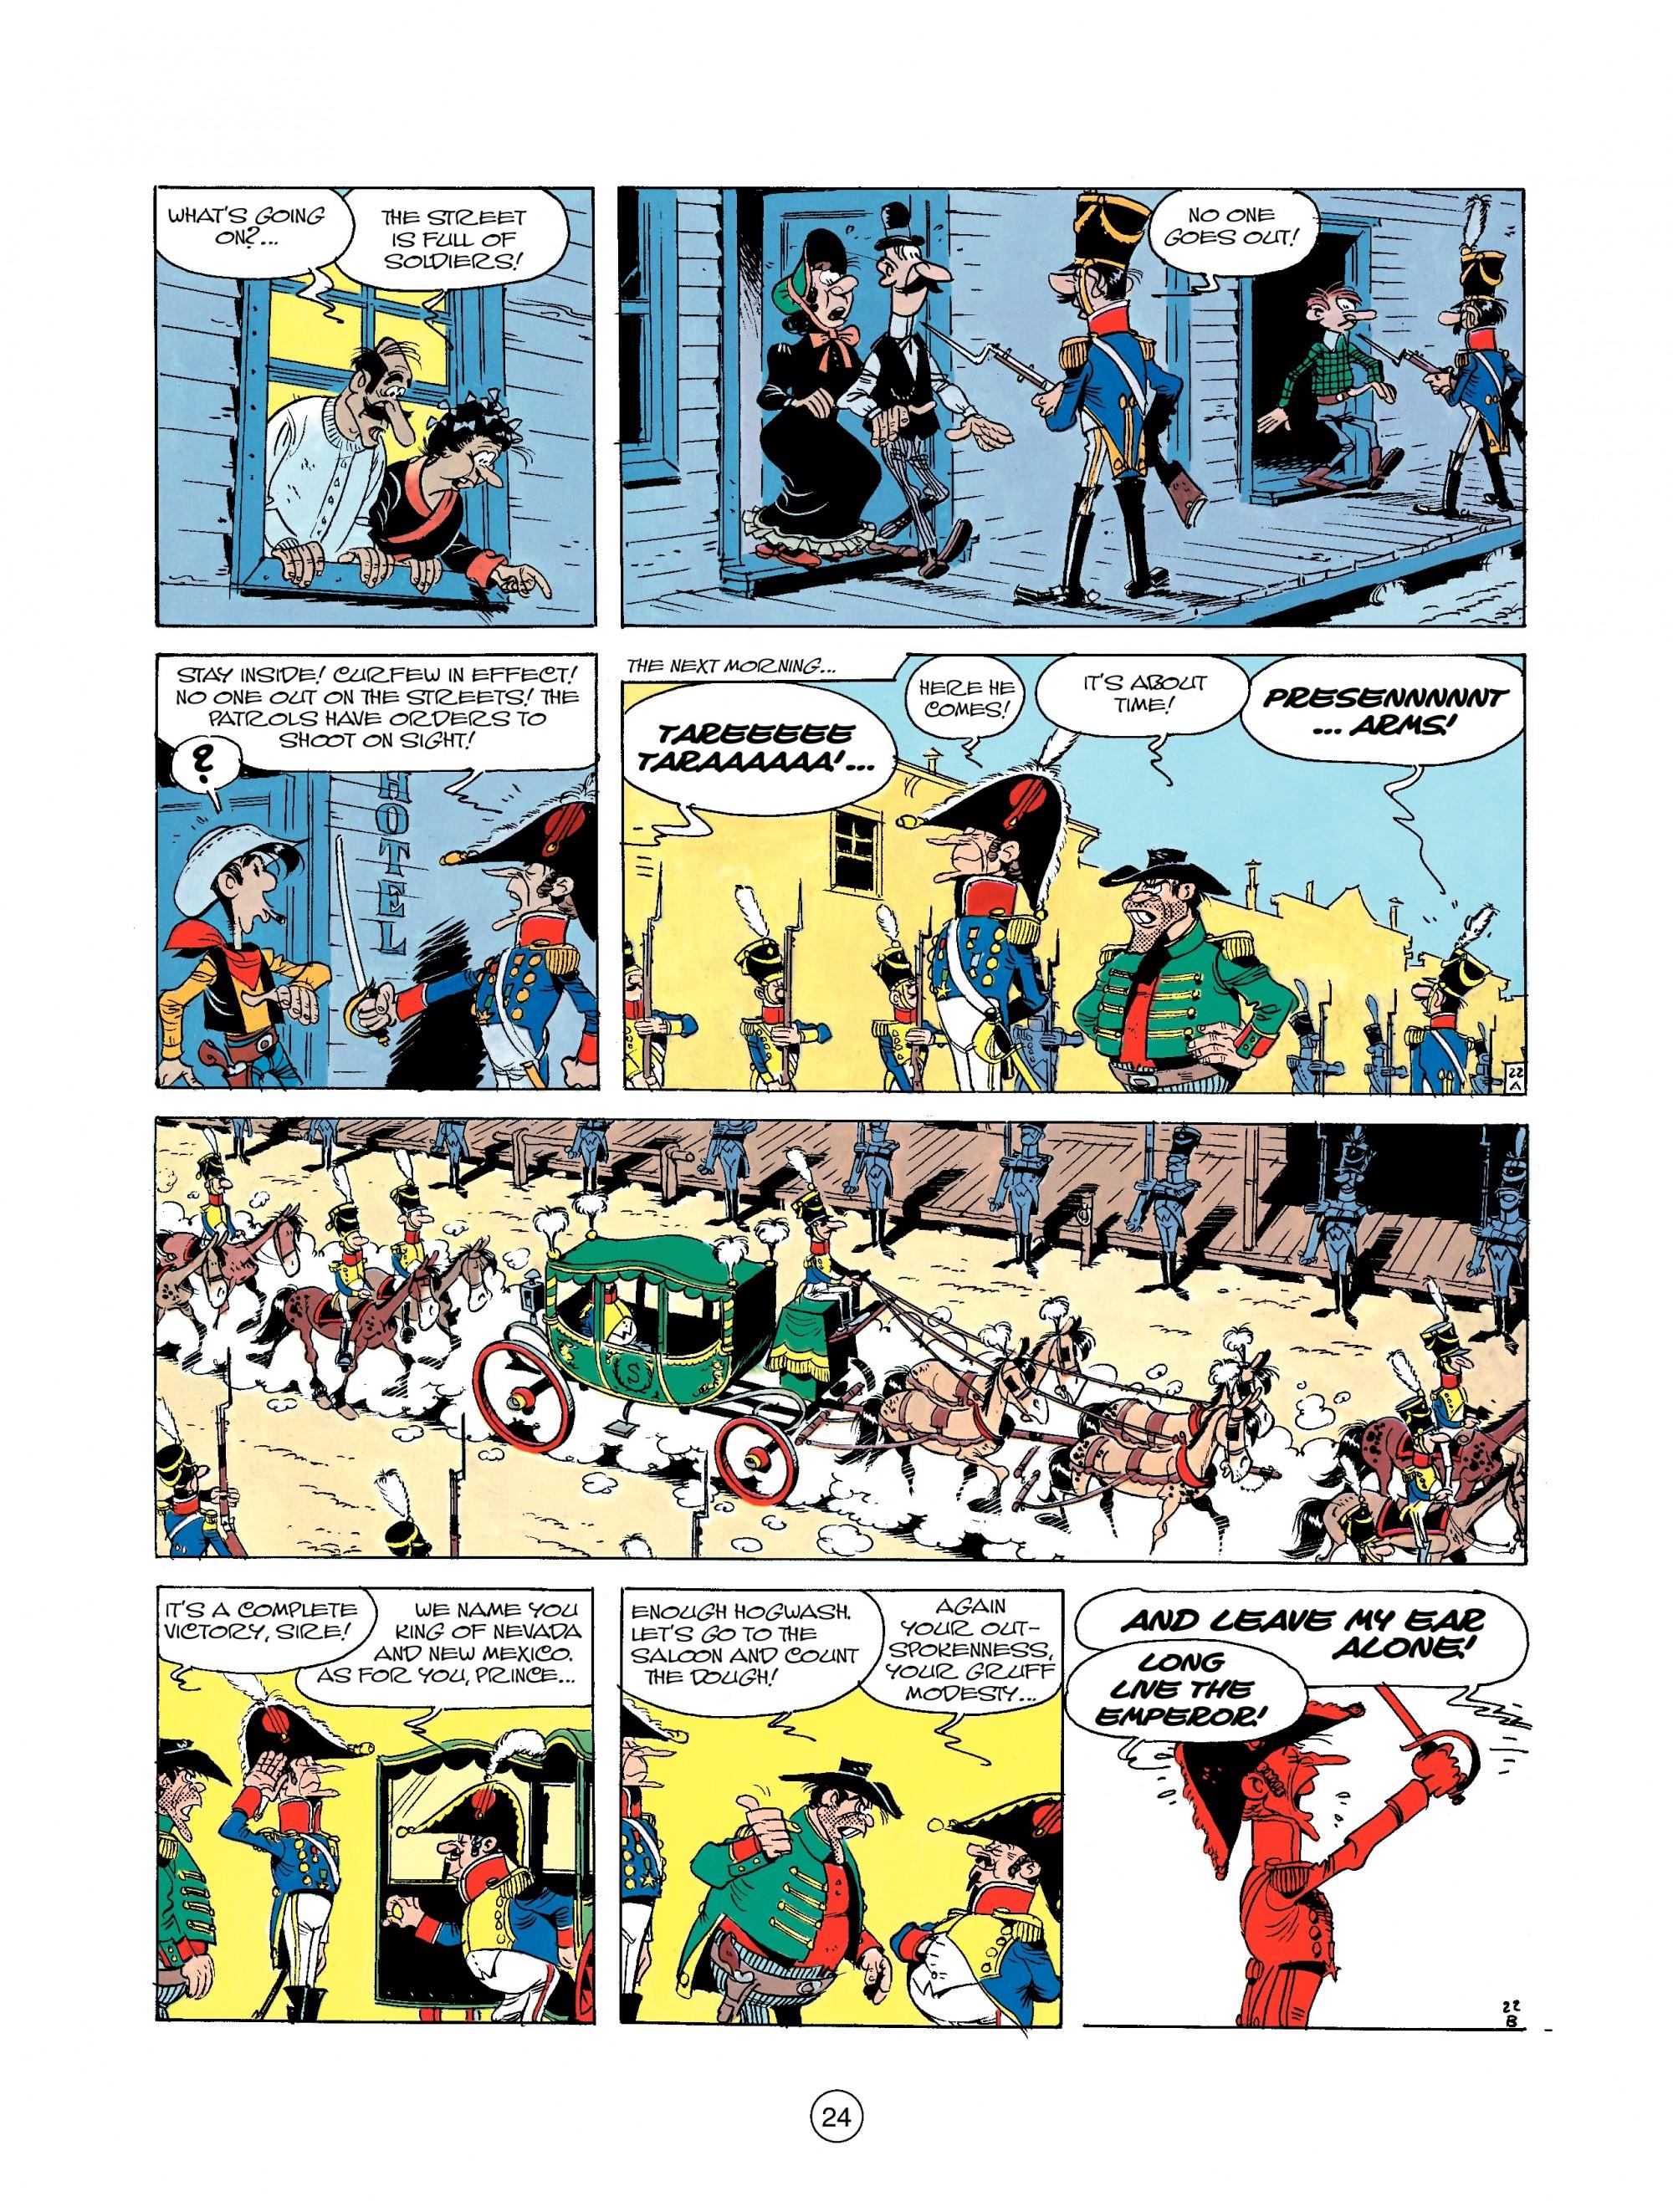 A Lucky Luke Adventure 22 Page 23